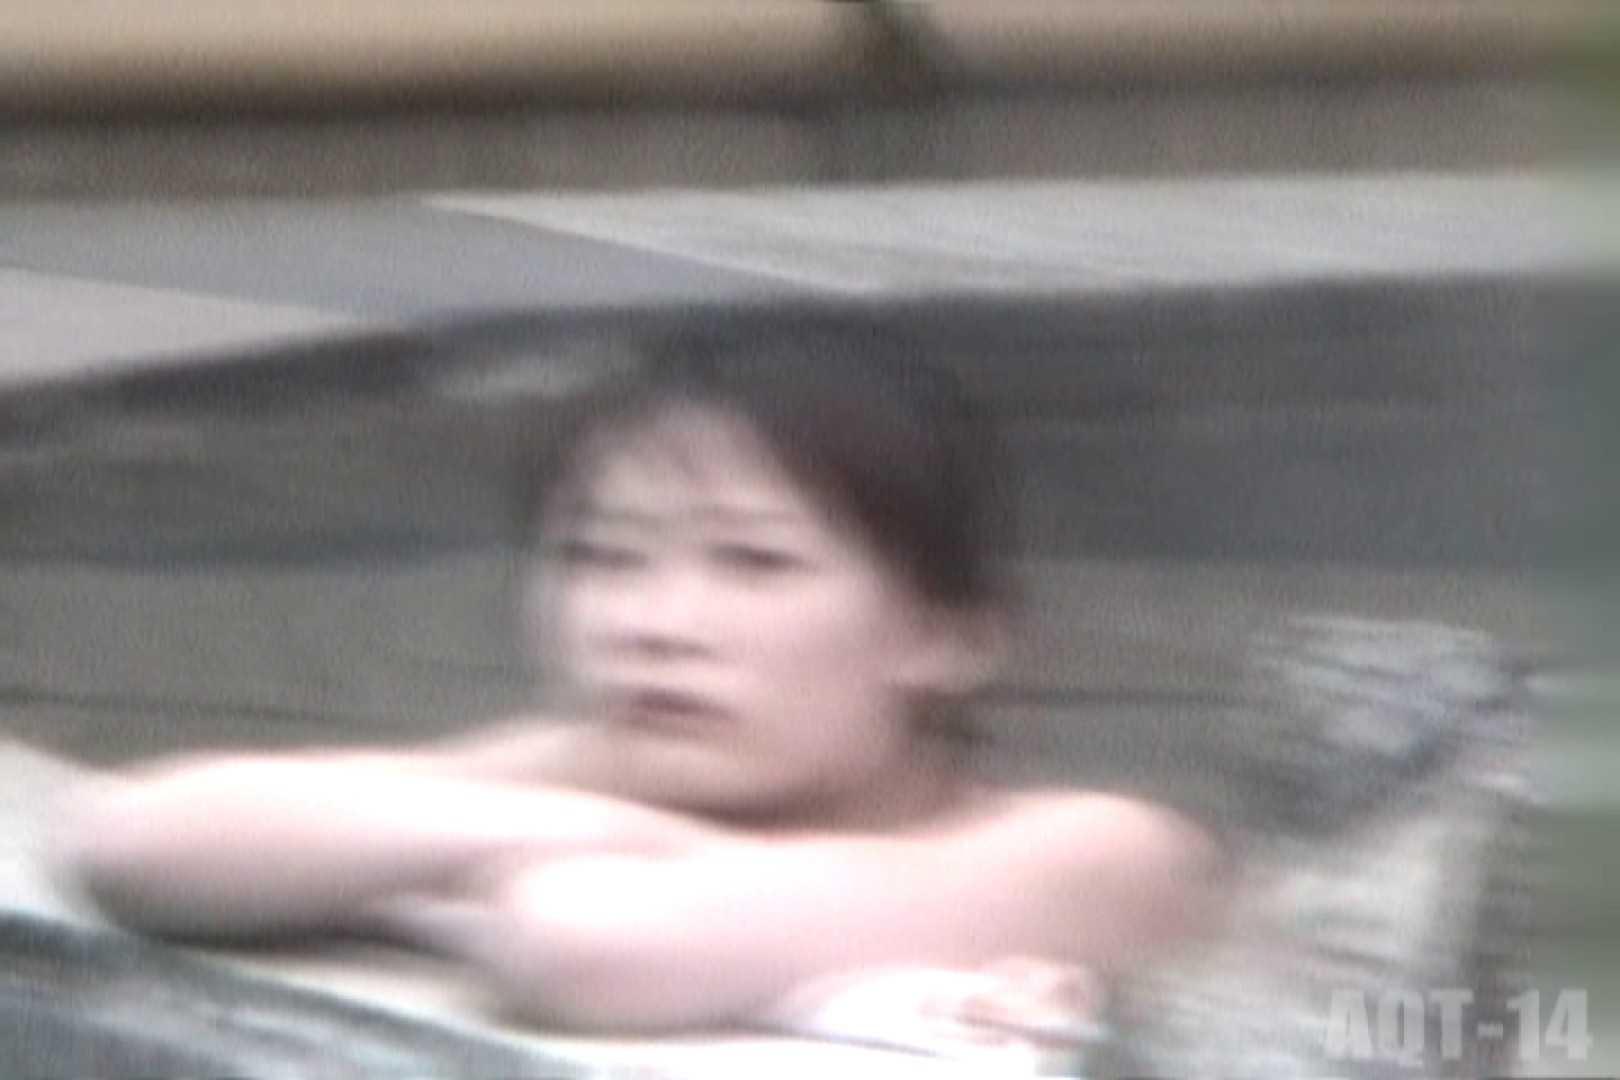 Aquaな露天風呂Vol.822 盗撮 オメコ無修正動画無料 62連発 8